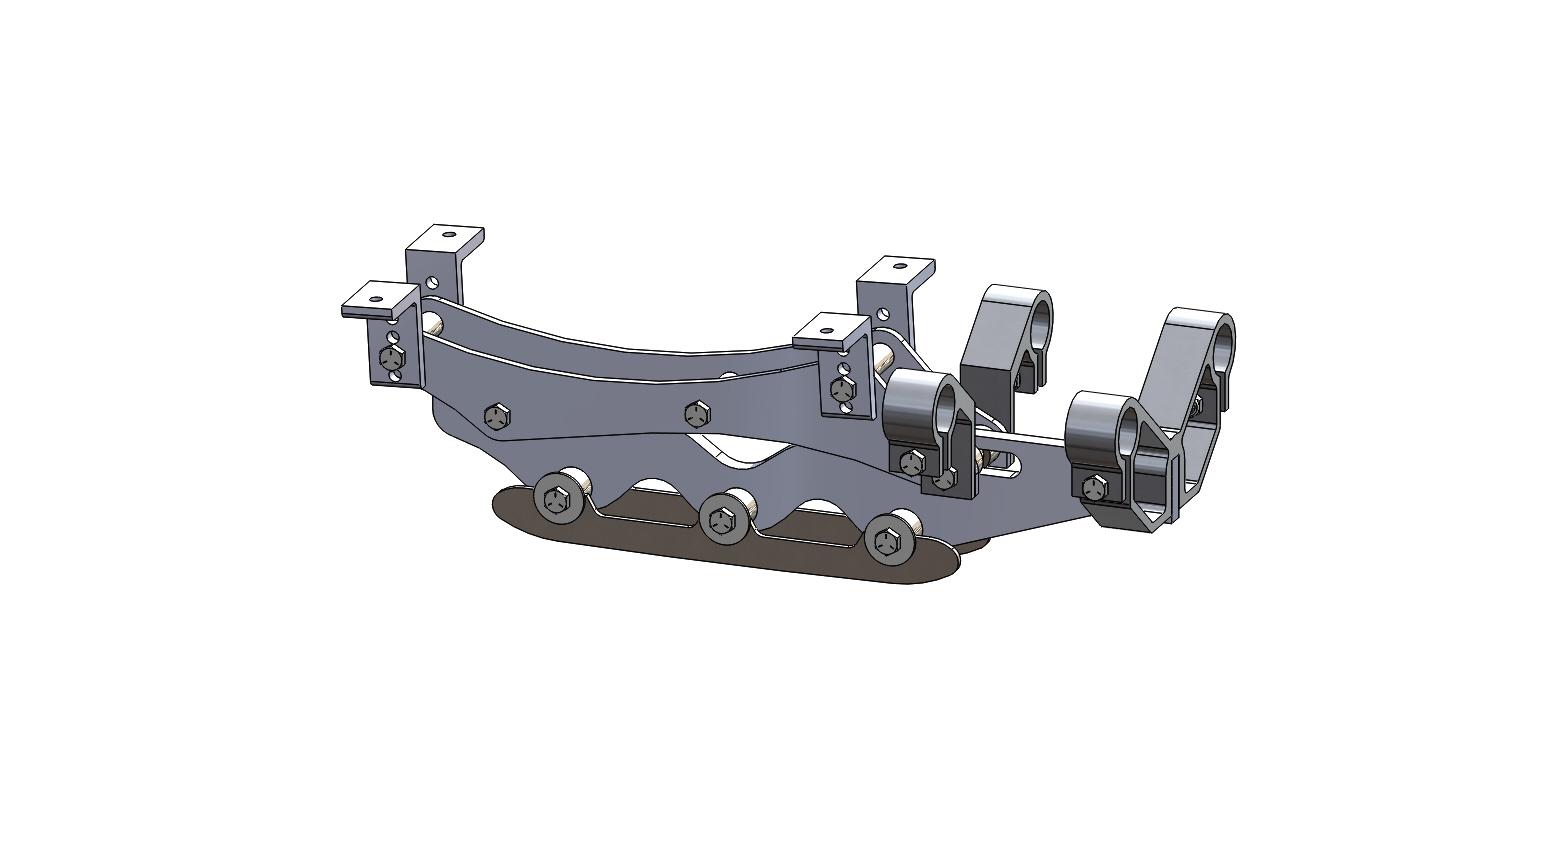 Wave Rear Frame Assembly 4 inch riser short blade